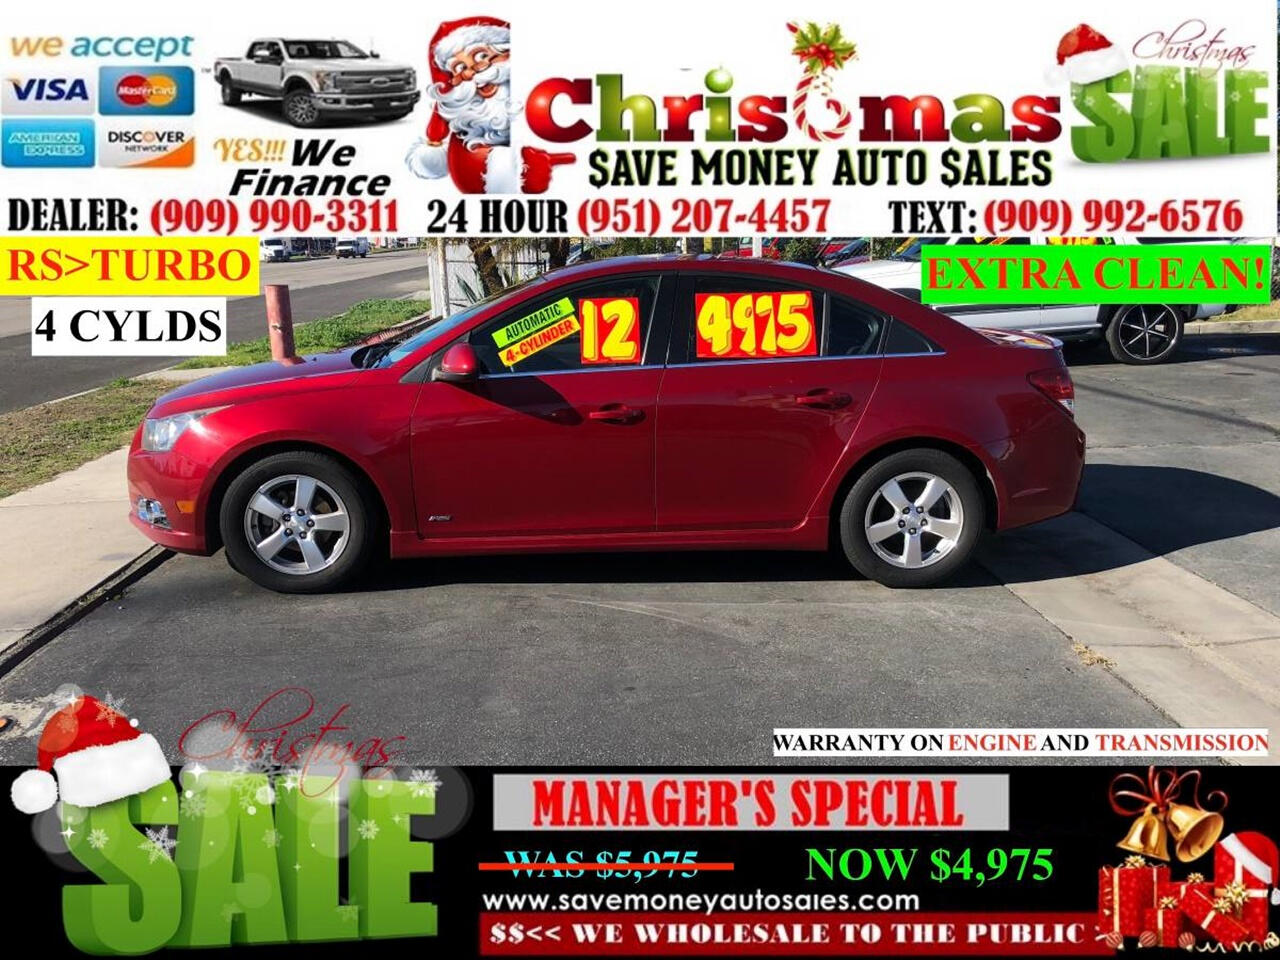 2012 Chevrolet Cruze 1LT TURBO